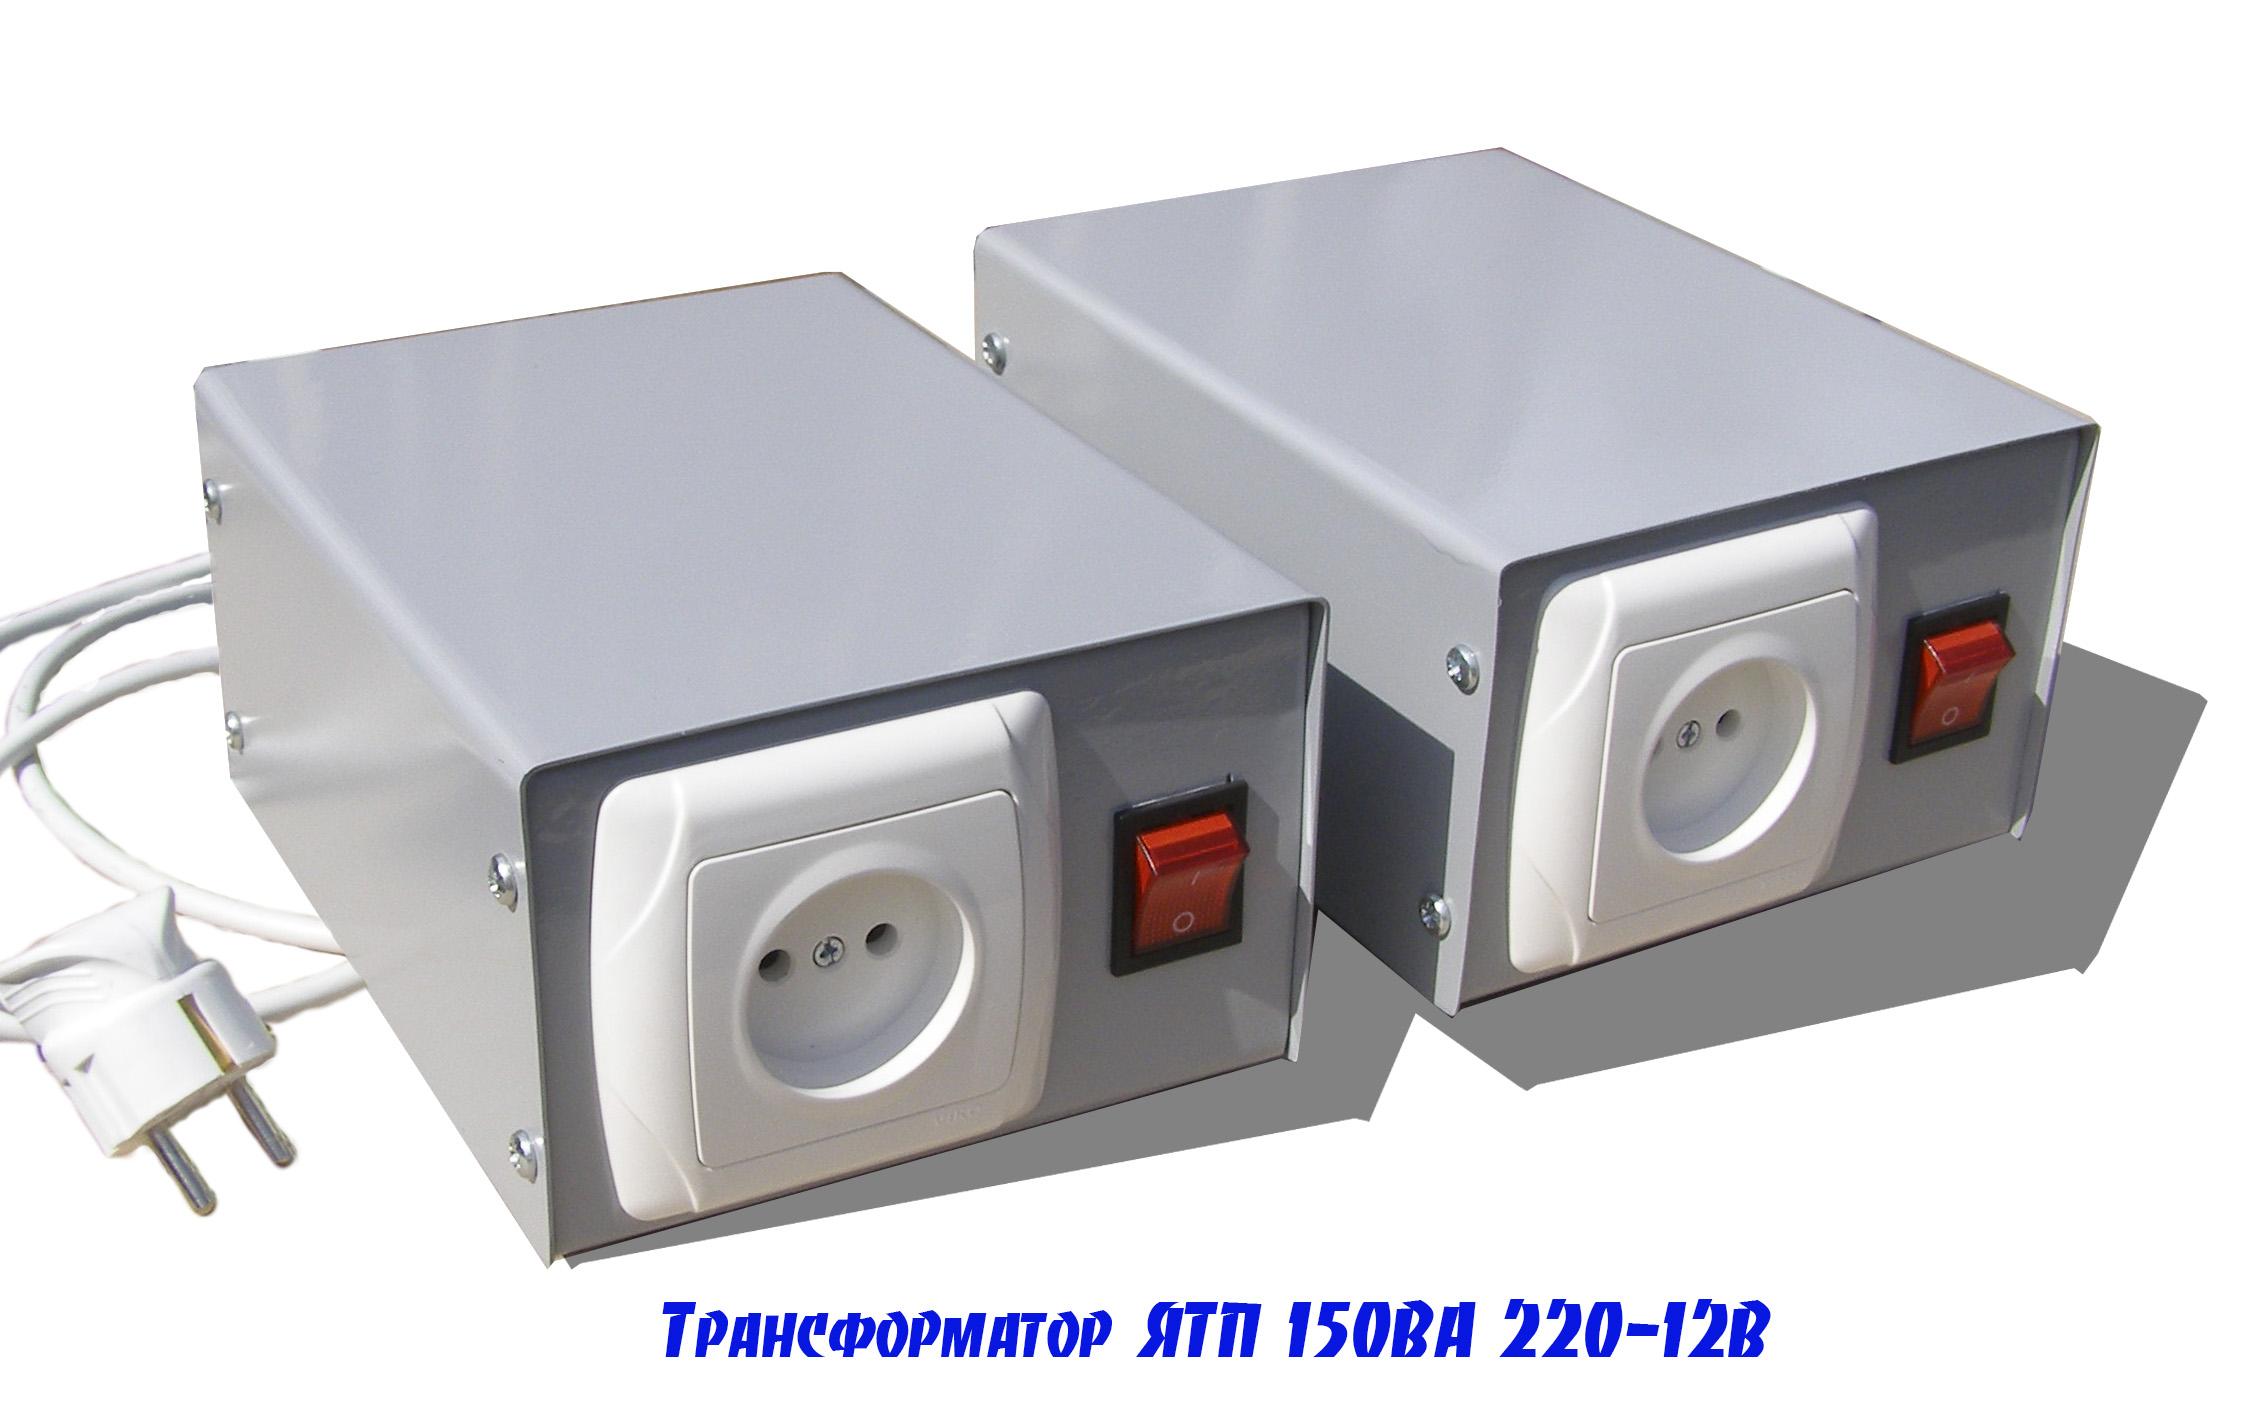 Трансформатор 150ВА ЯТП в корпусе